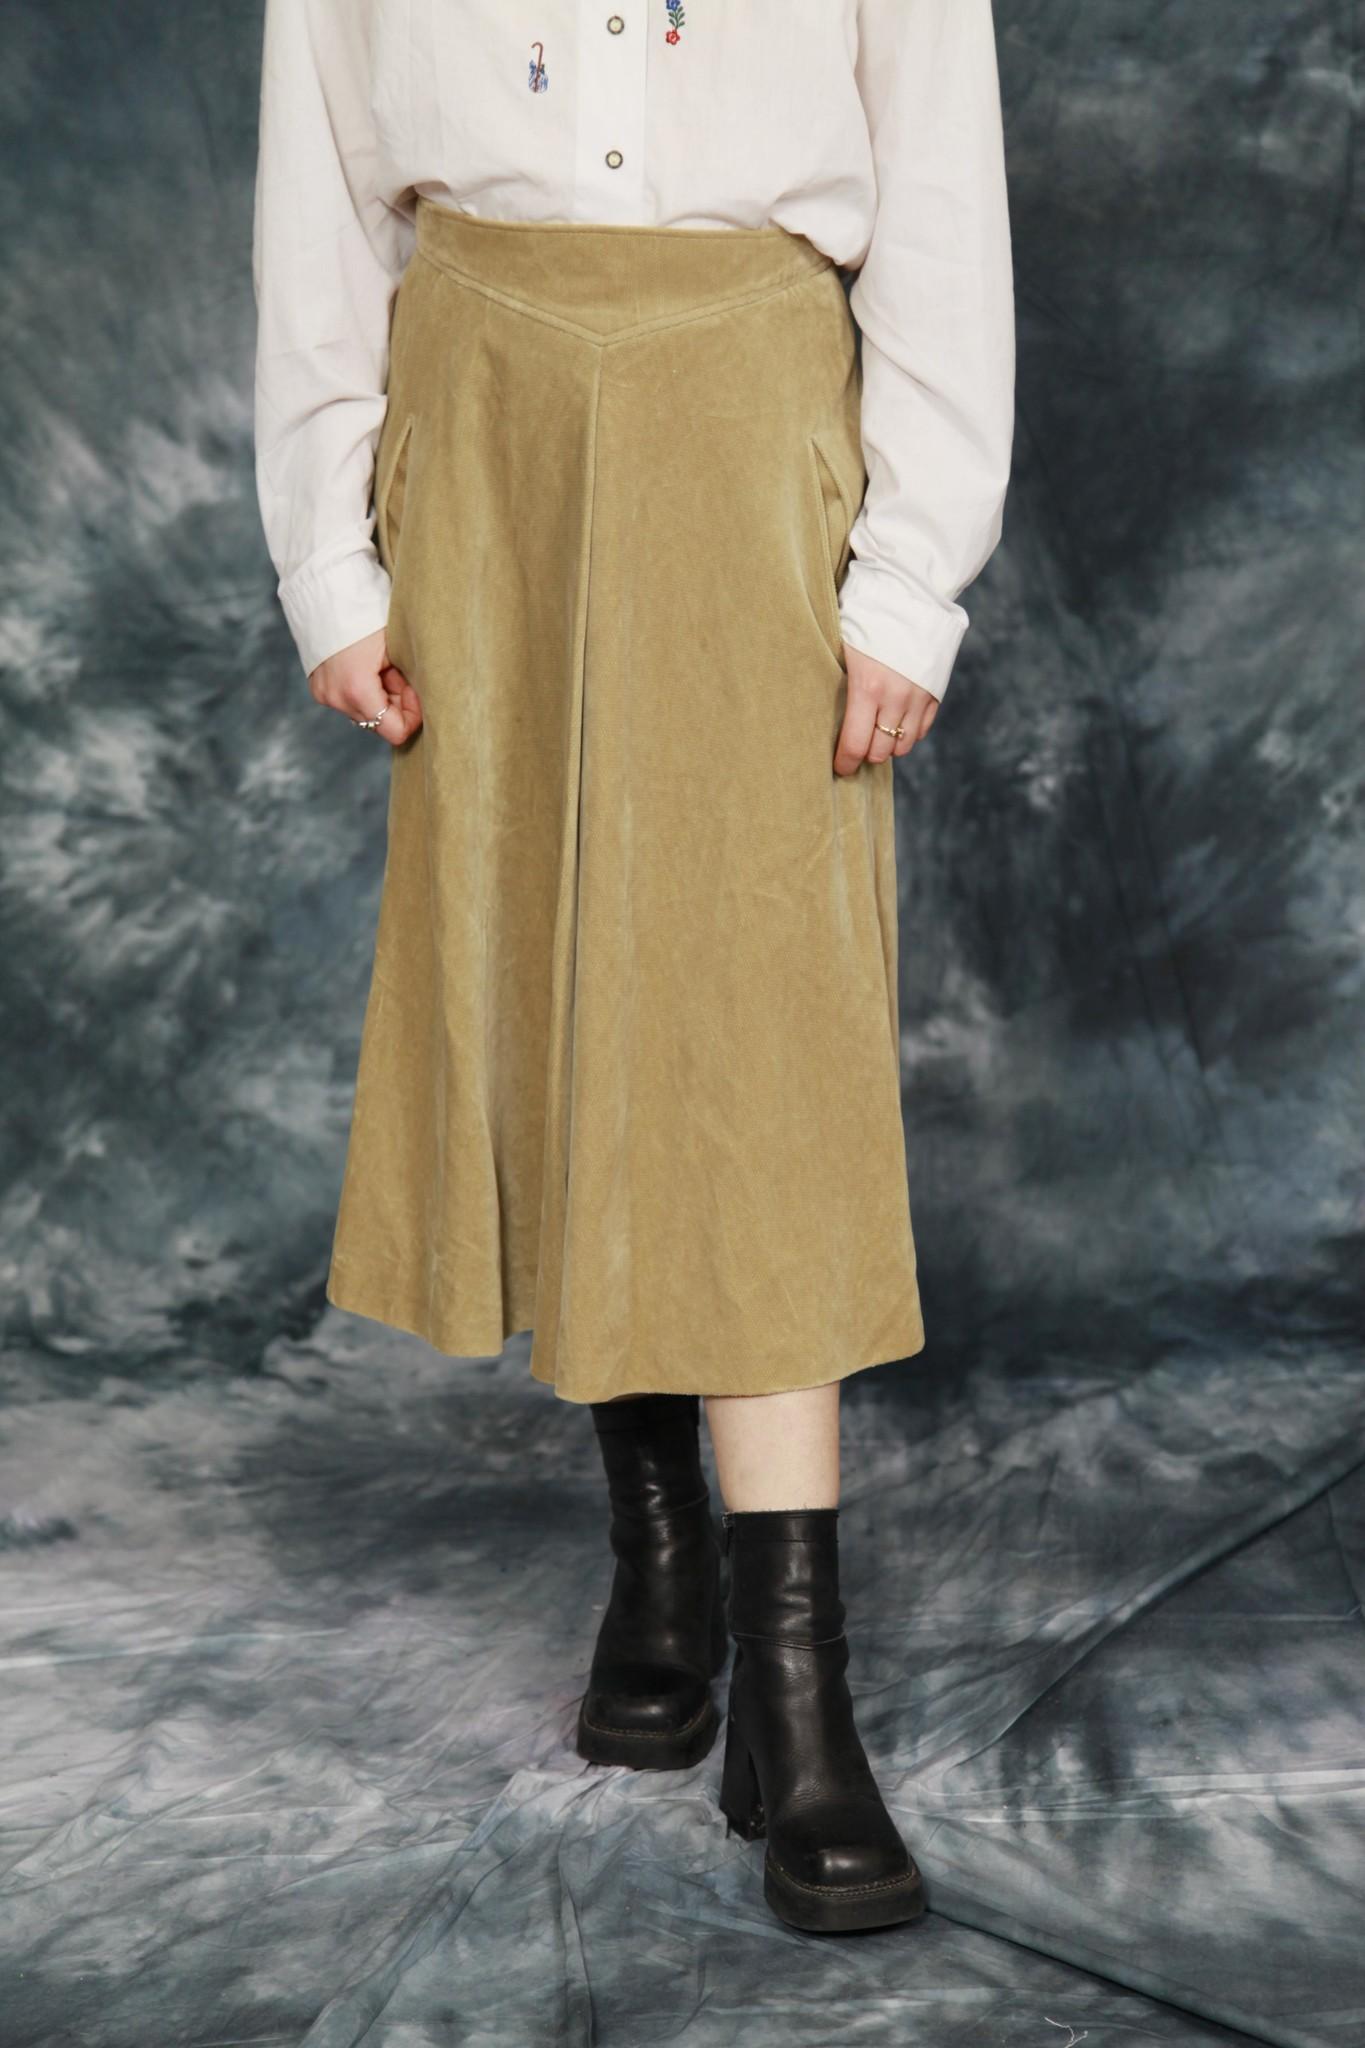 Classy A-line skirt